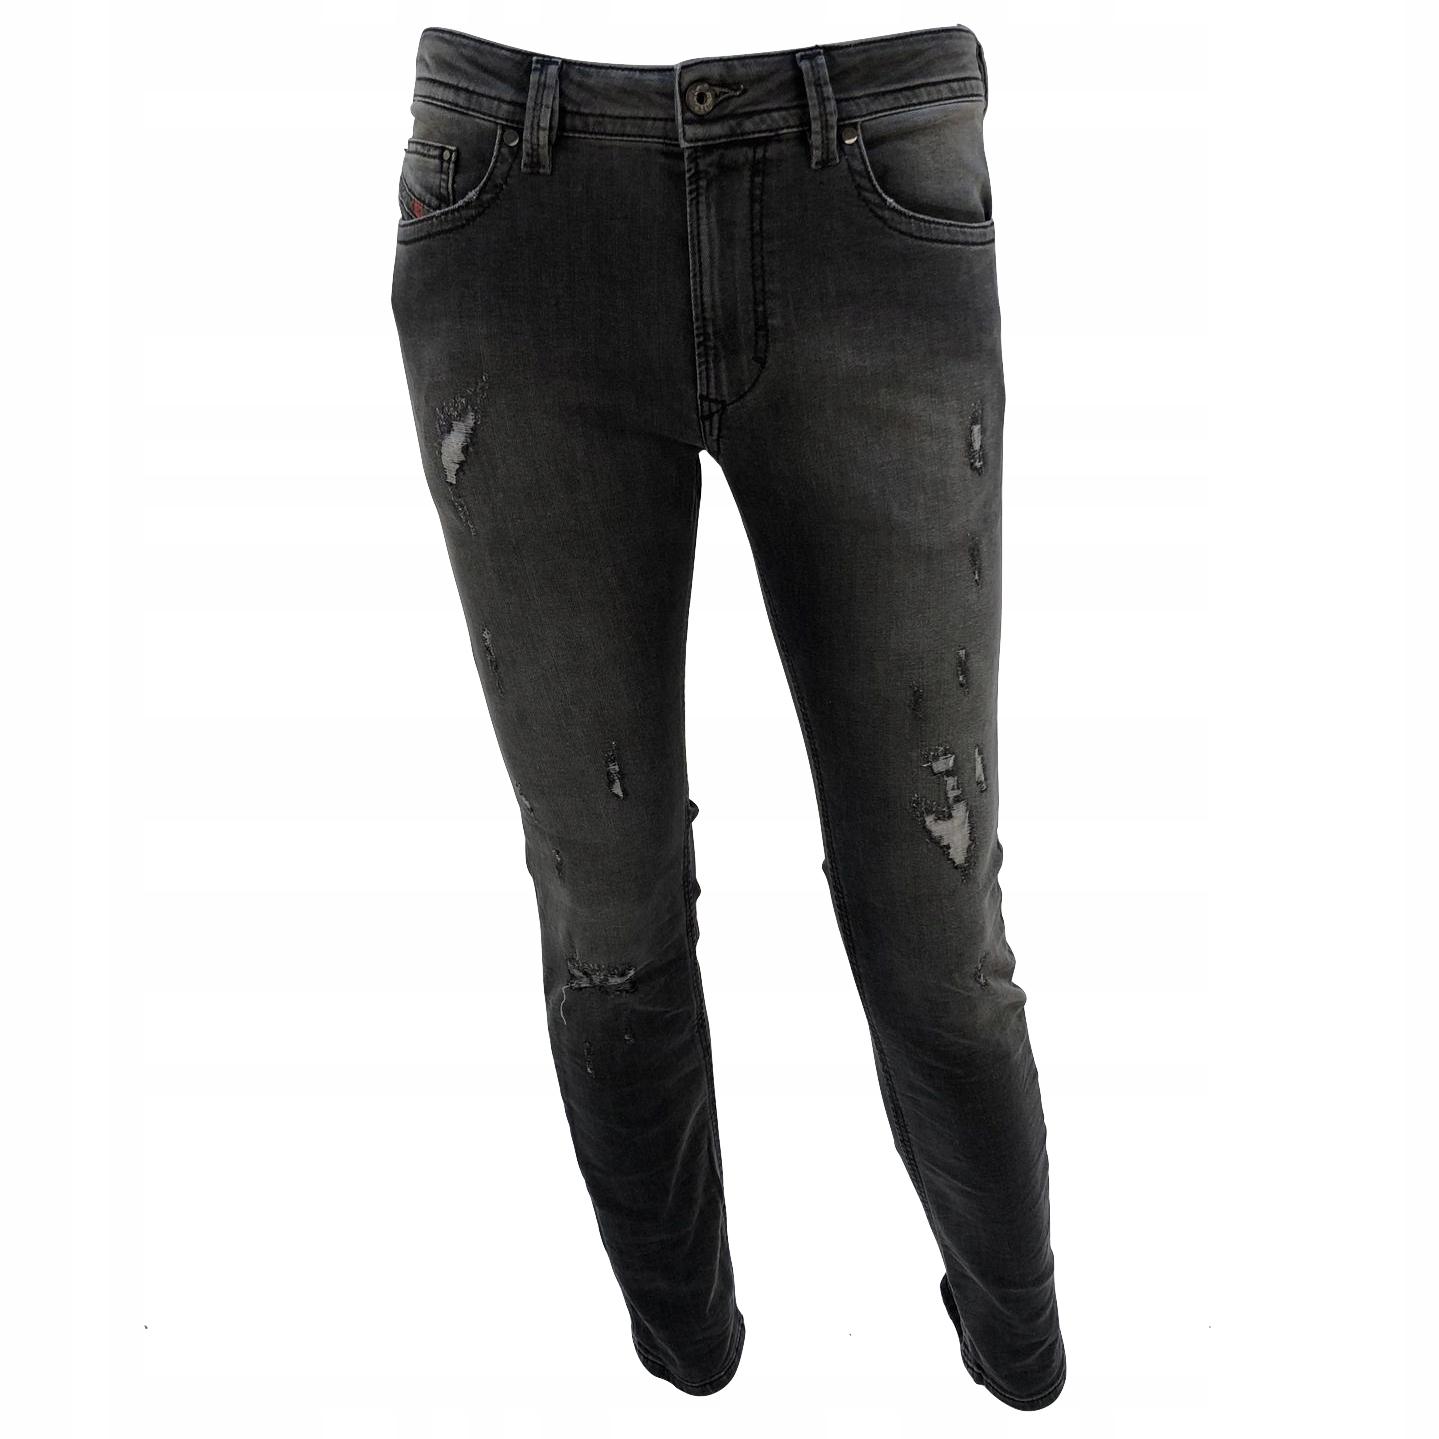 Spodnie Diesel Jeans THAVAR 0673P 02 31x30 -60%